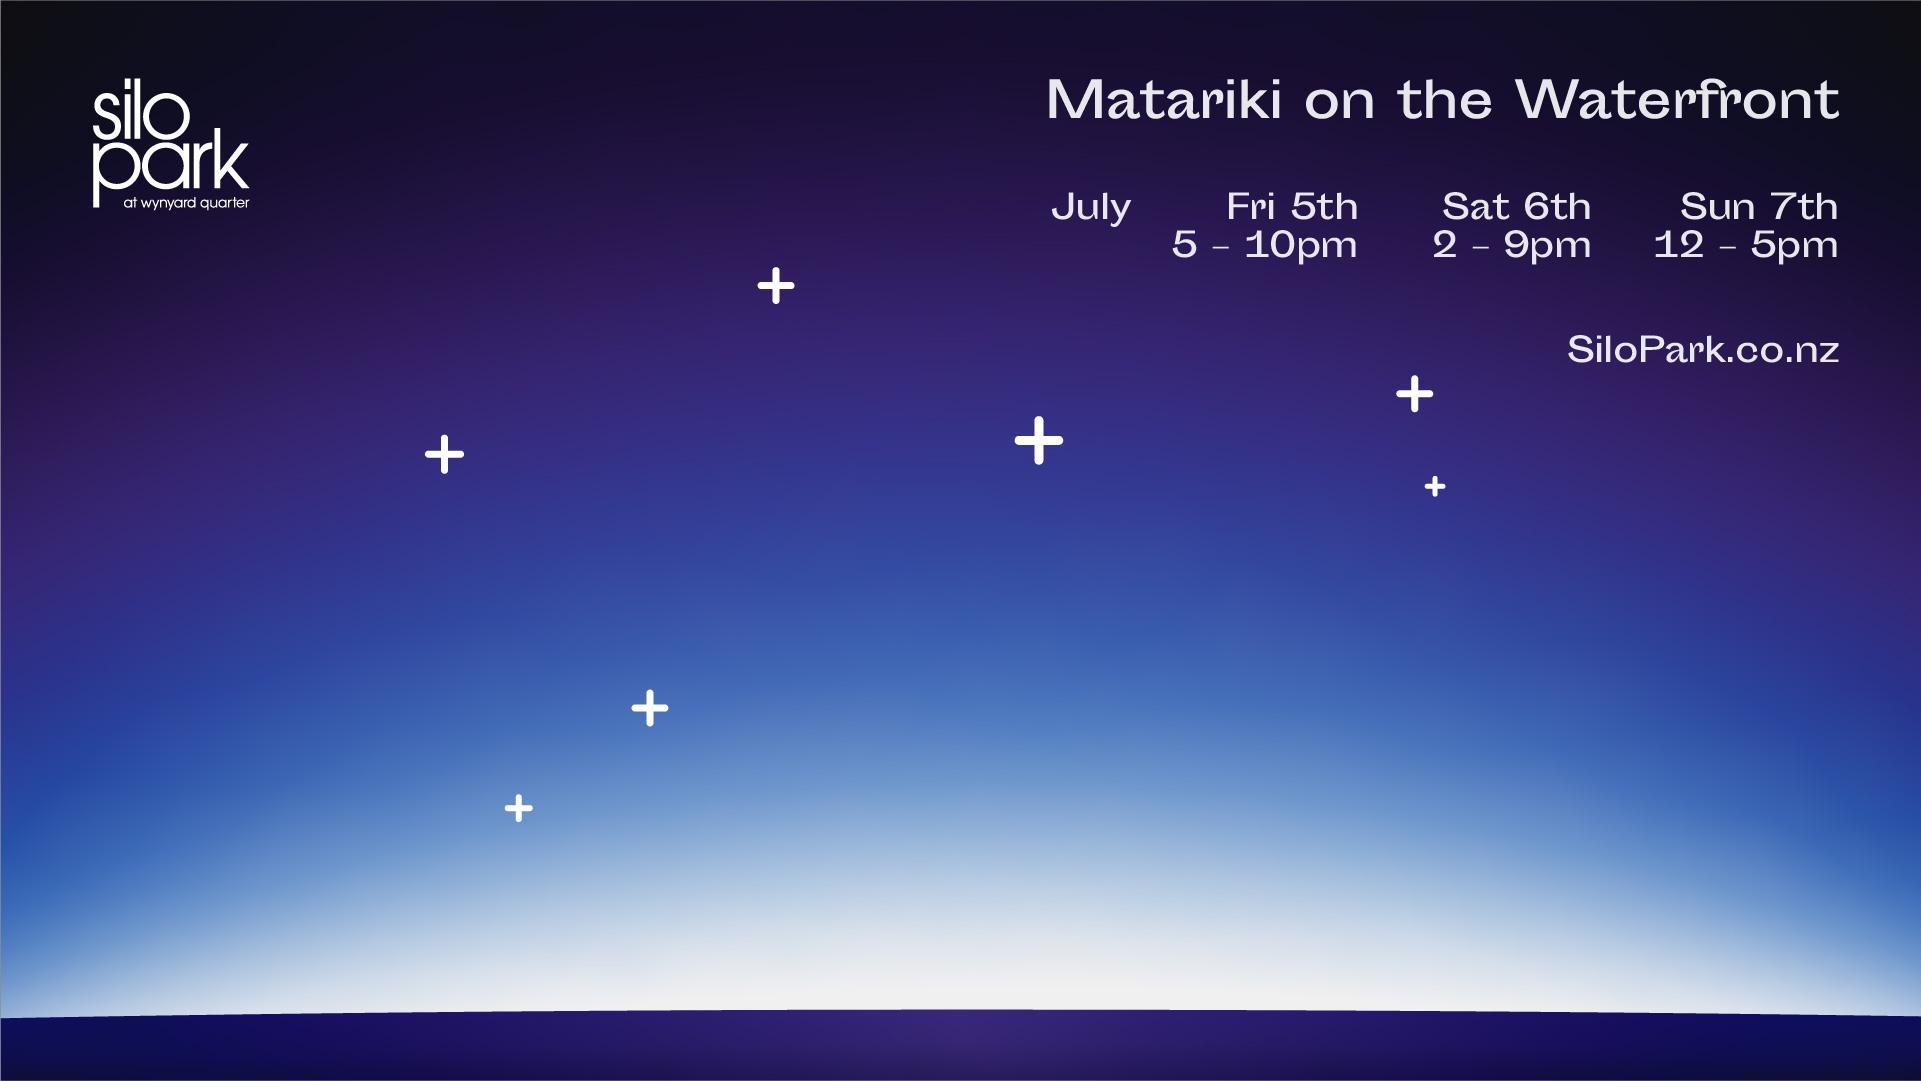 SiloPark_Matariki2019_Static_FB.jpg